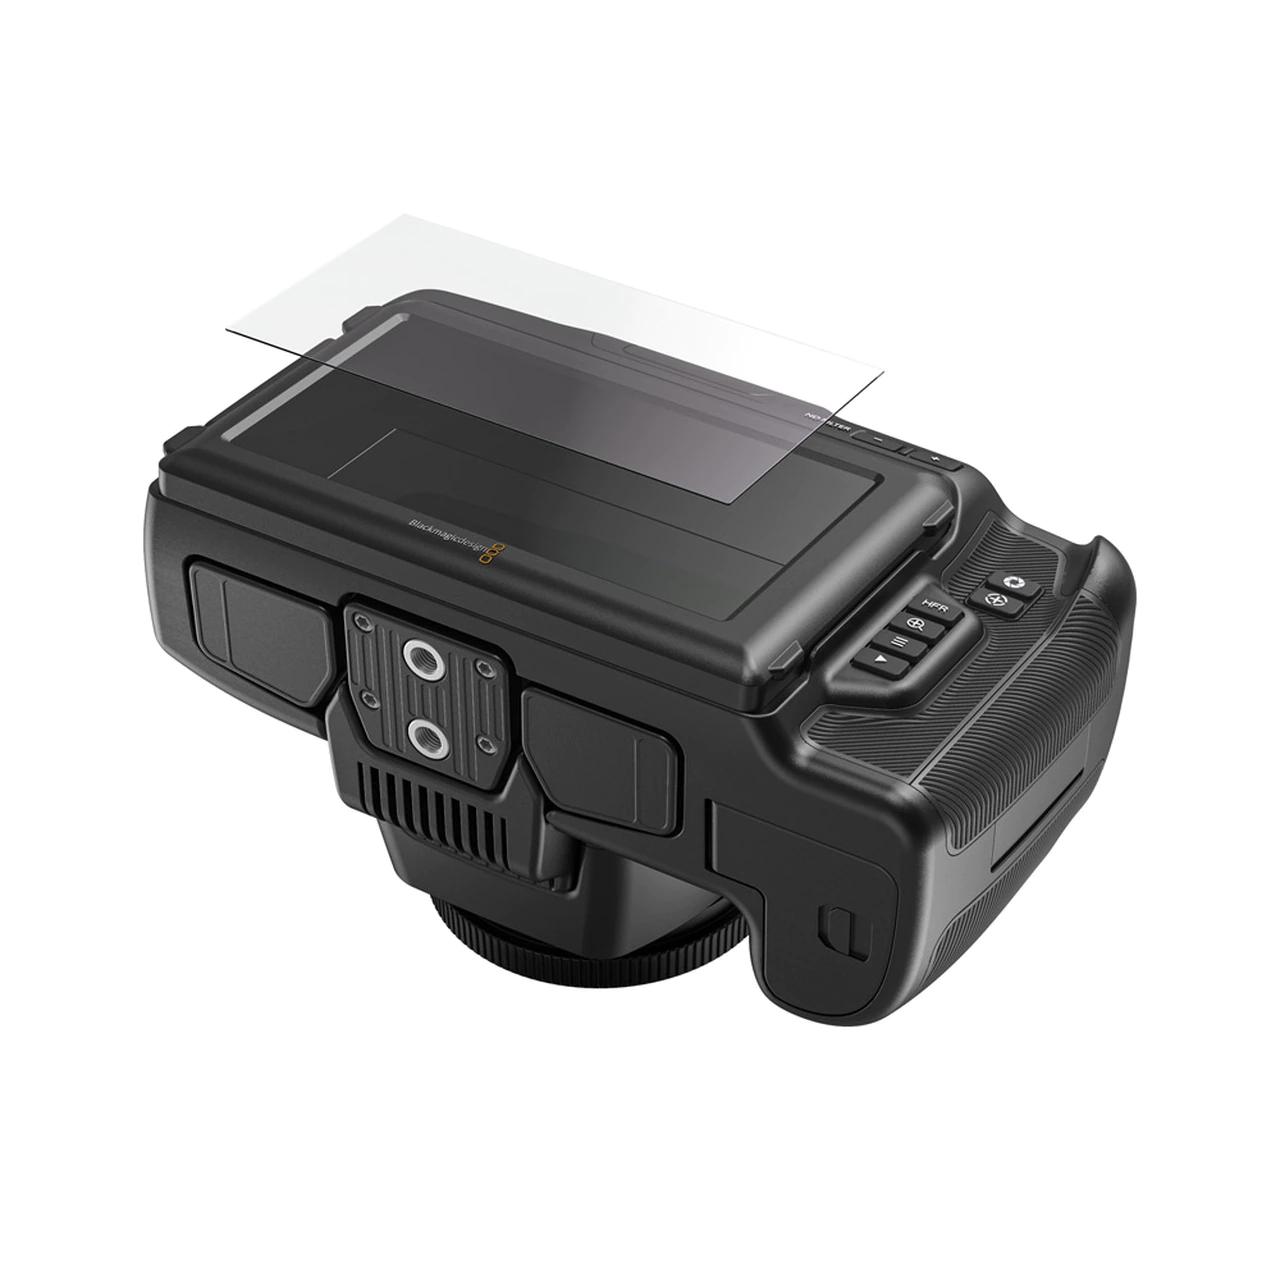 smallrig-3274-screen-protector-szk%C5%82o-hartowane-os%C5%82ona-ekranu-bmpcc-pocket-6k-pro-06.jpg